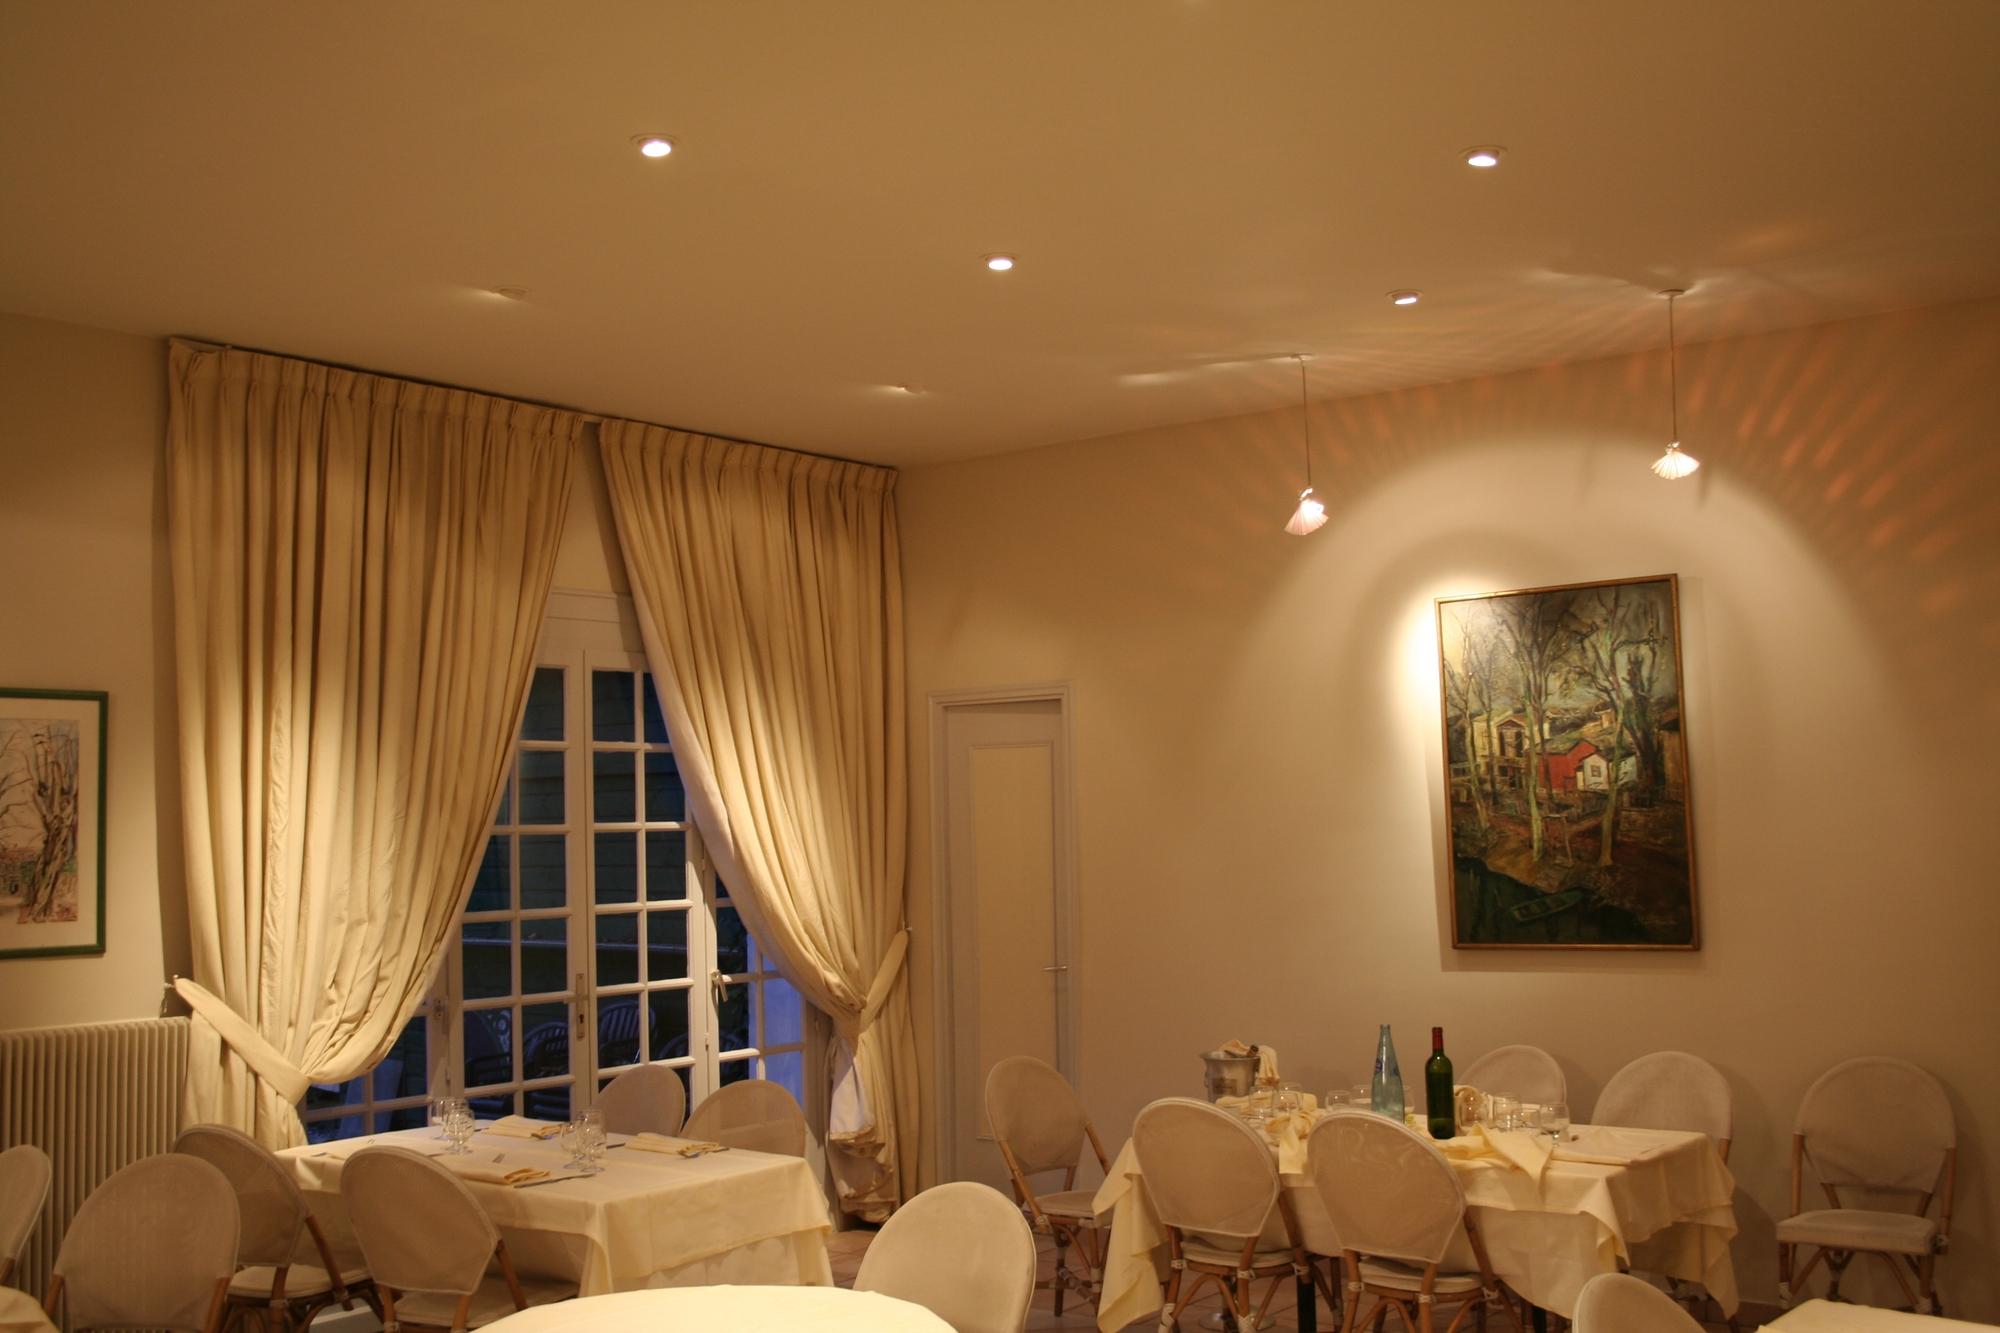 Domaine-Ste-Catherine-salle-de-restaurant2